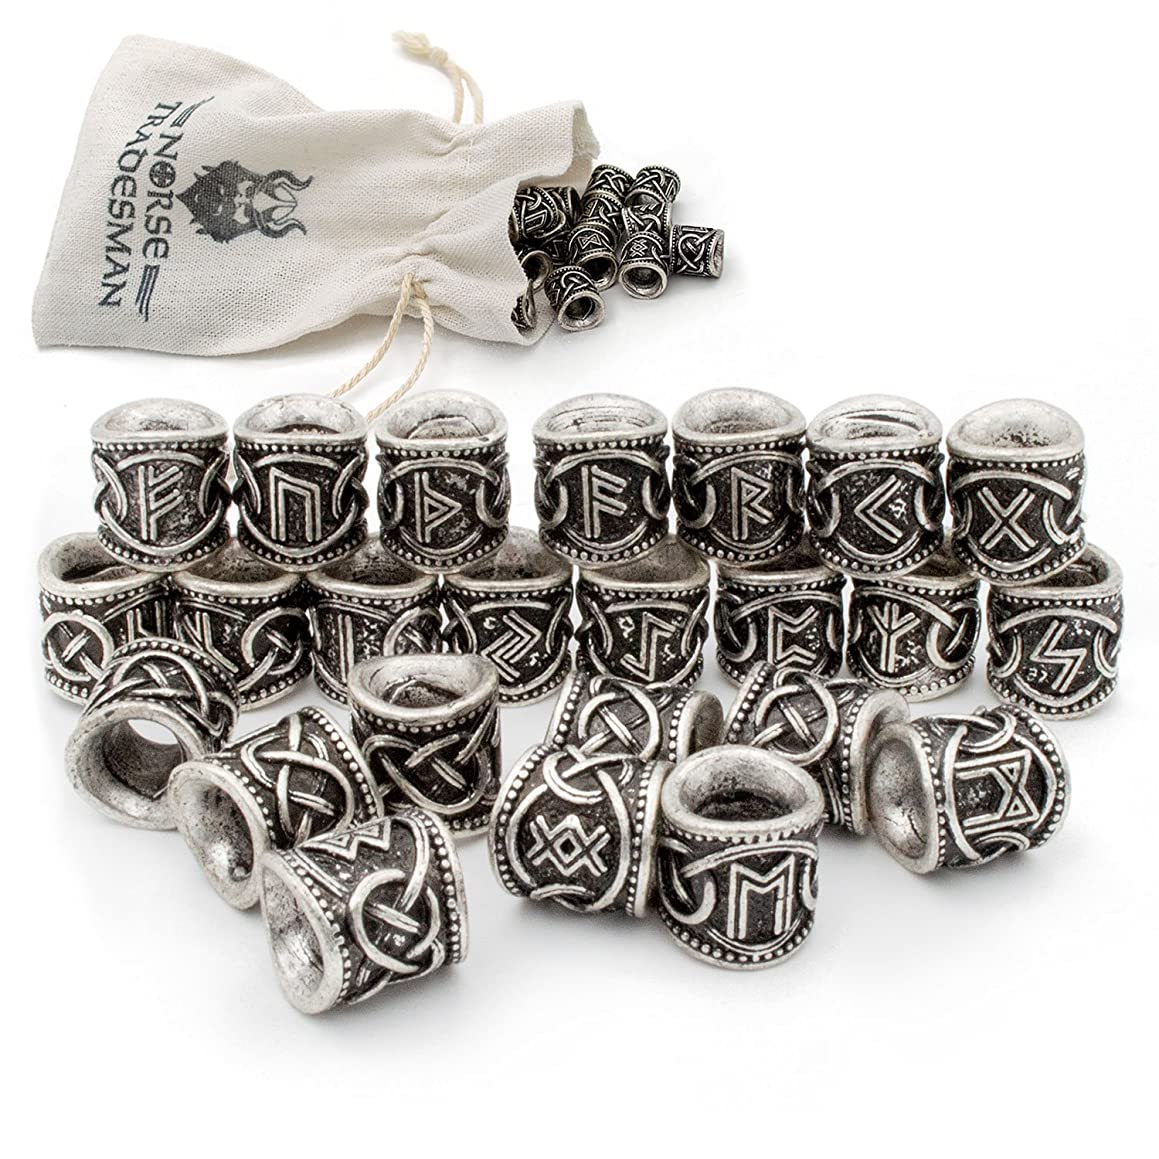 Viking Rune Beard Bead Set (24) - Norse Rings for Hair, Dreads & Beards